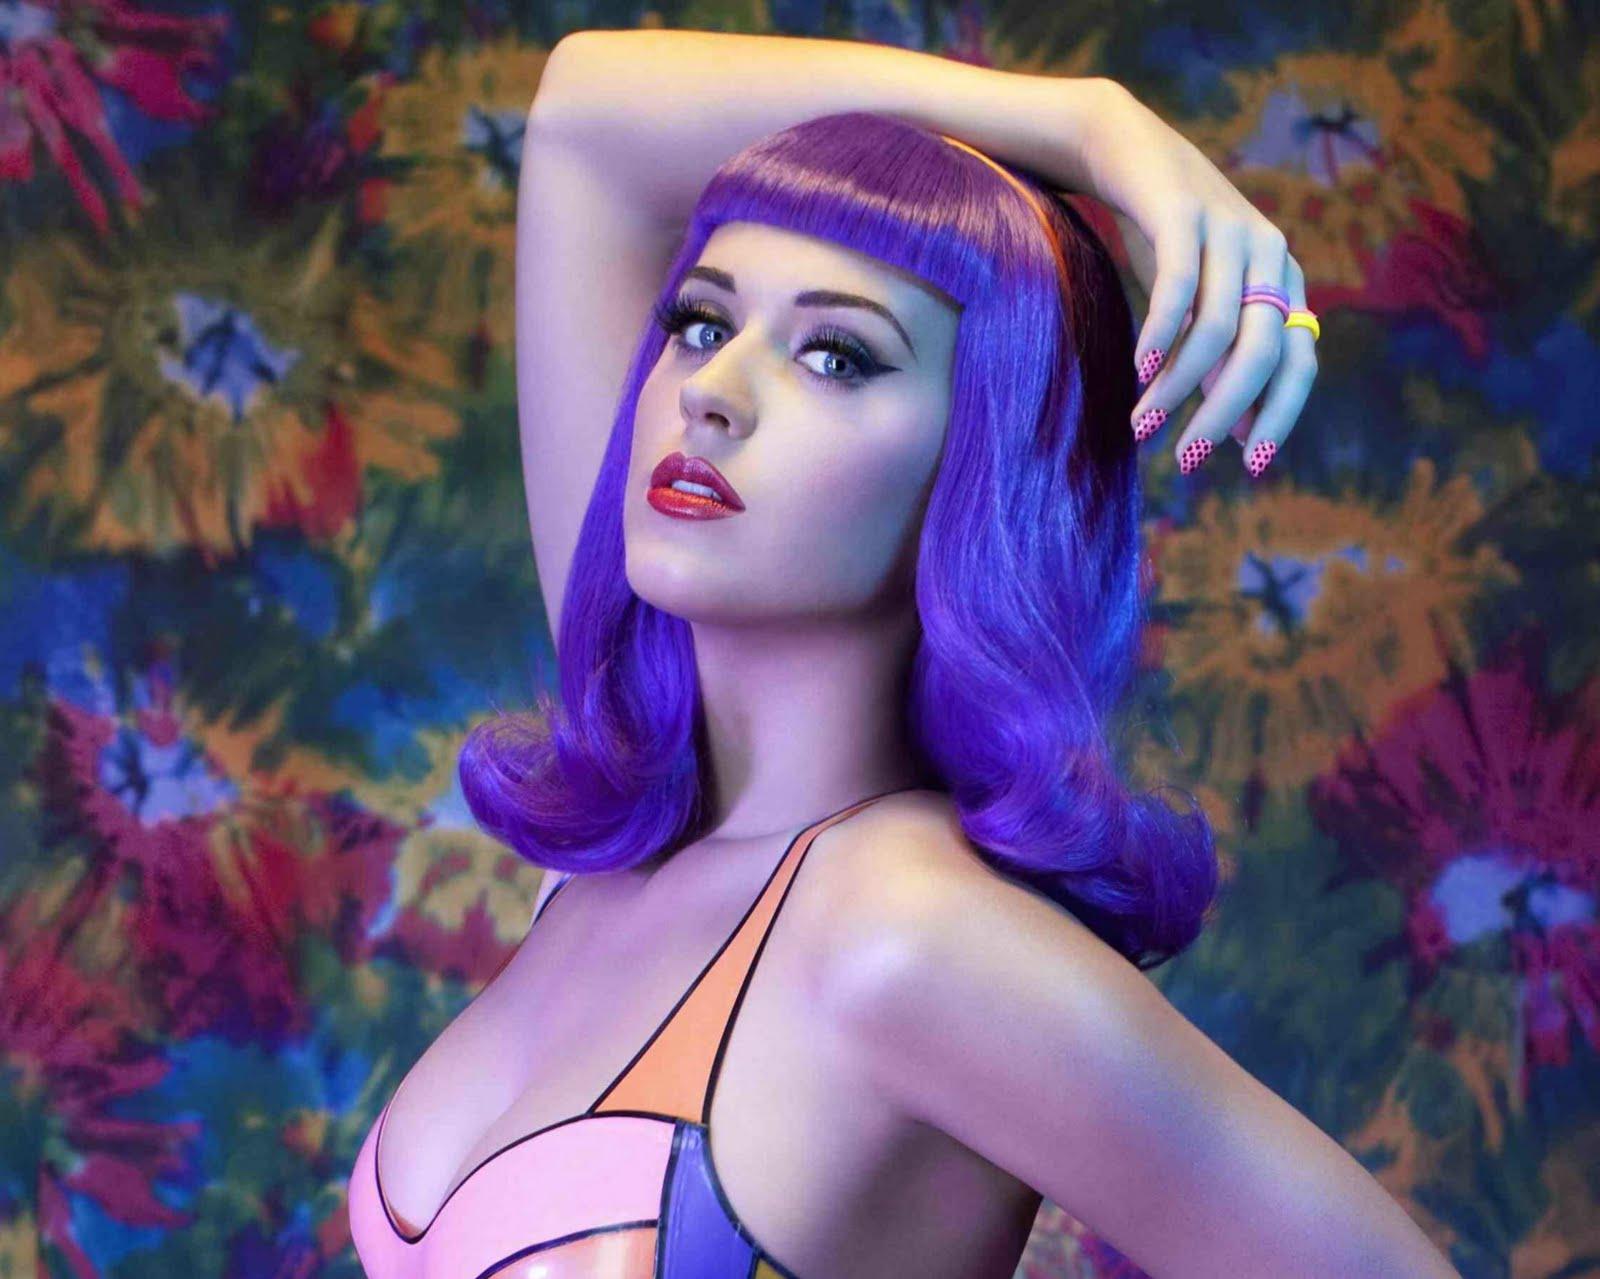 http://2.bp.blogspot.com/_cyH_7sPxVcQ/TGK6ZHlBonI/AAAAAAAAEbo/0Ts5c1QBX9Q/s1600/Katy+Perry+in+Teenage+Dream+Promo+Photoshoot+(1).jpg